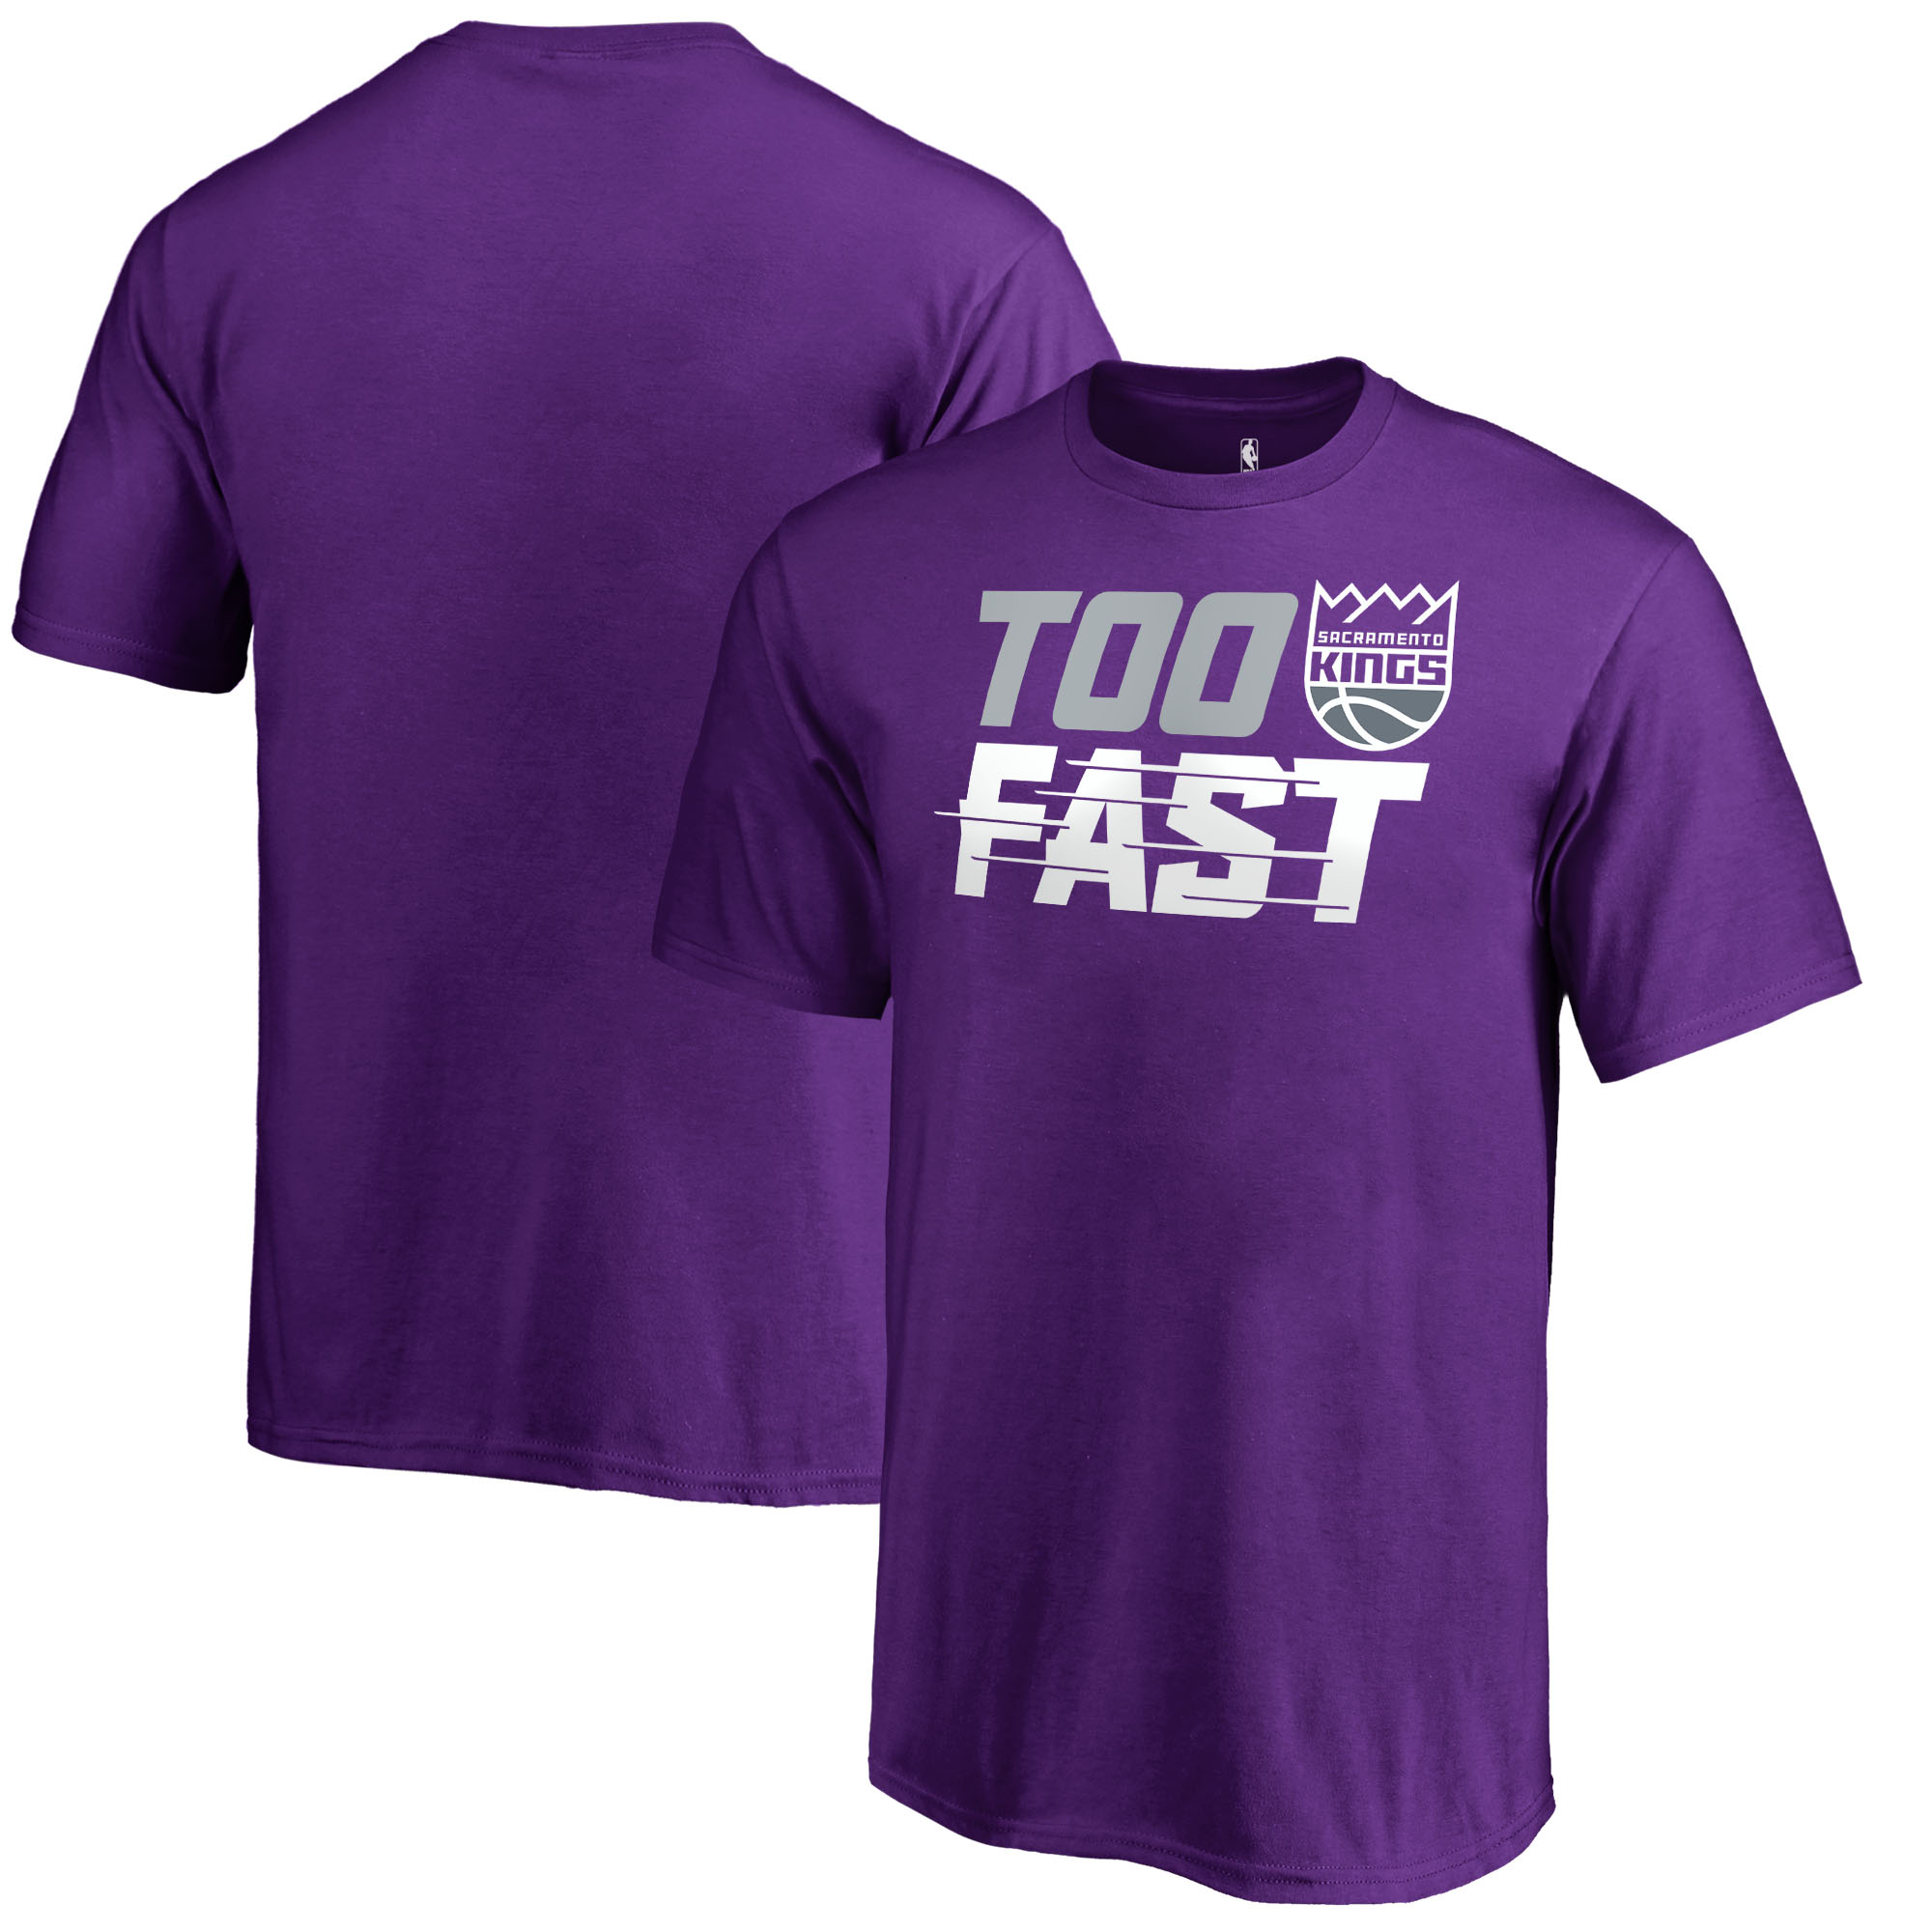 Sacramento Kings Fanatics Branded Youth Too Fast T-Shirt - Purple